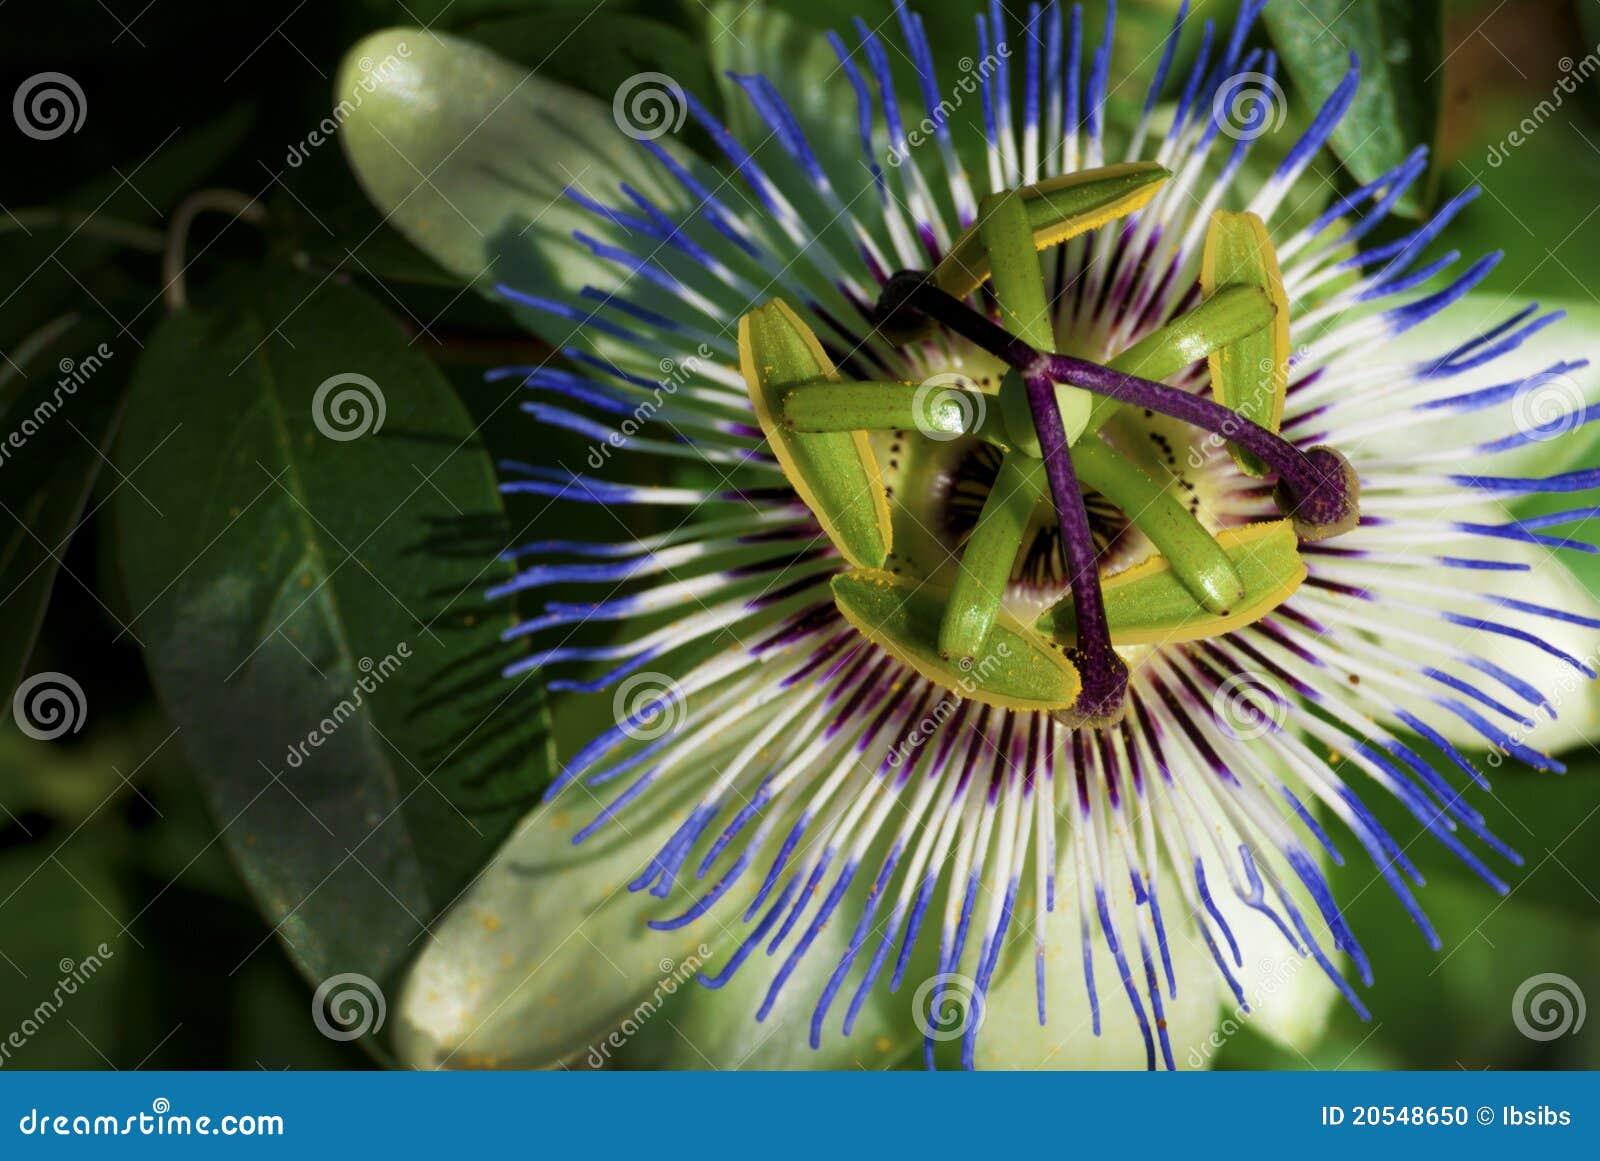 fleur de kiwi photo stock image 20548650. Black Bedroom Furniture Sets. Home Design Ideas